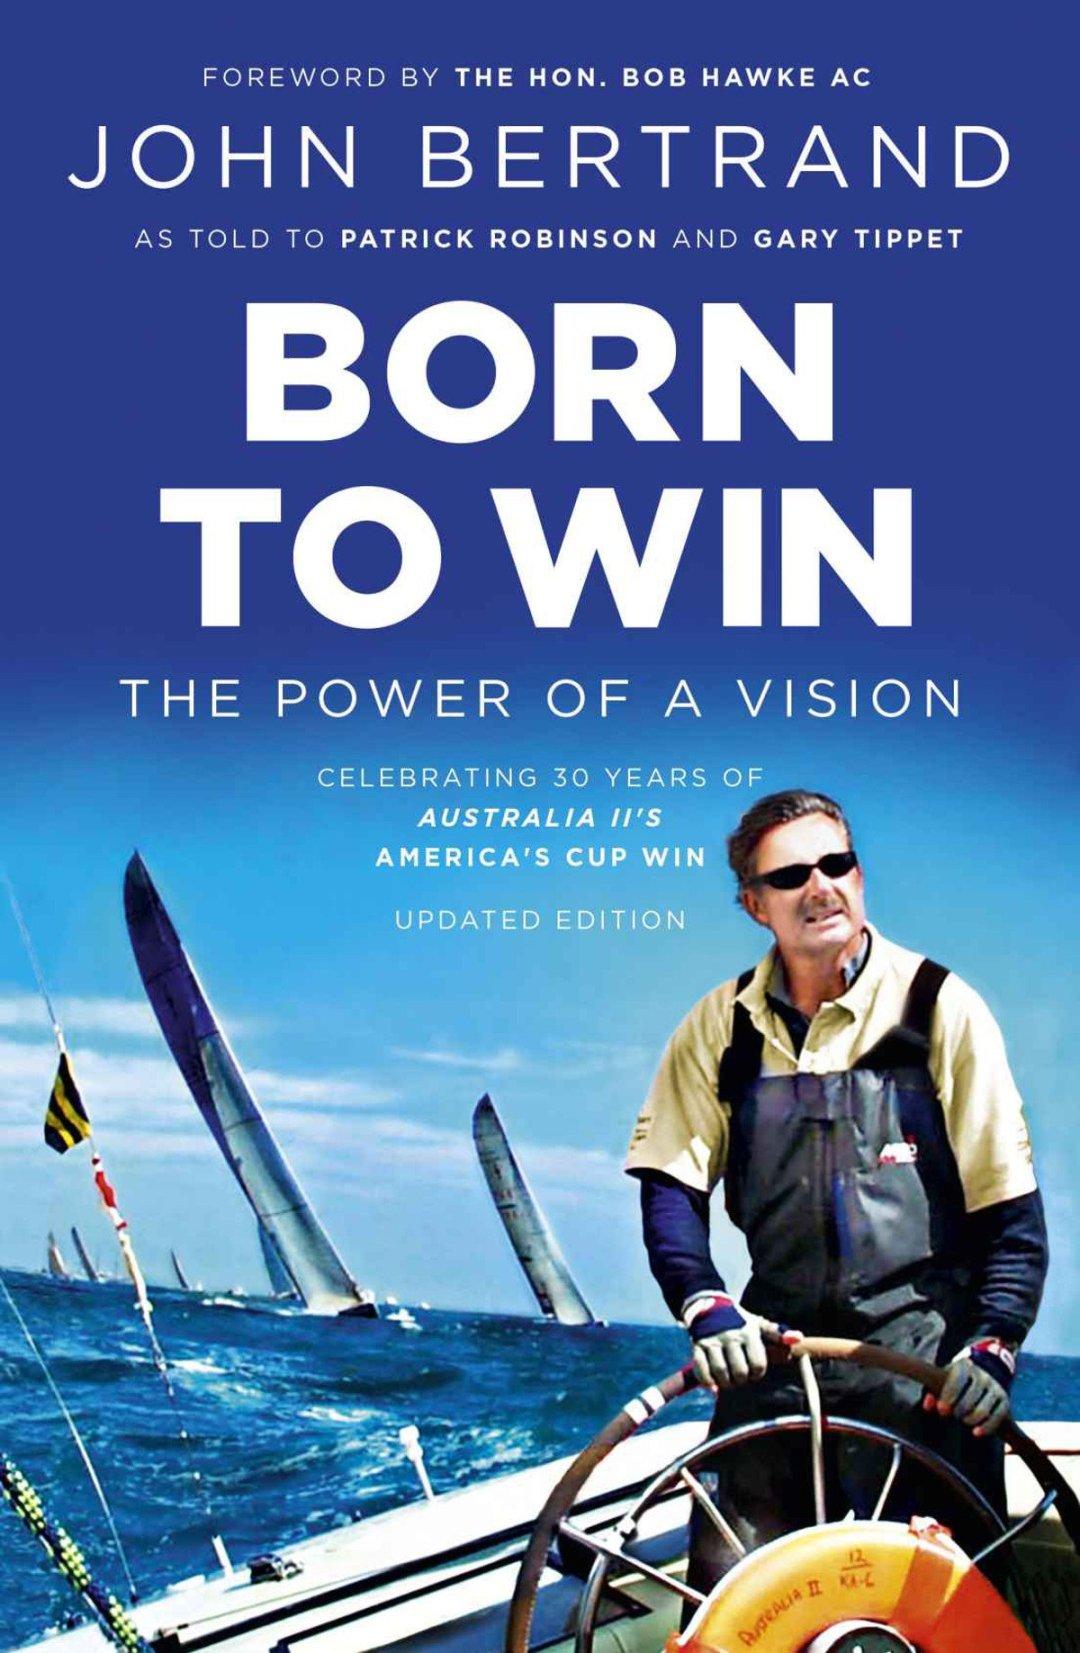 Born to Win - John Bertrand Double-barrelled Travel